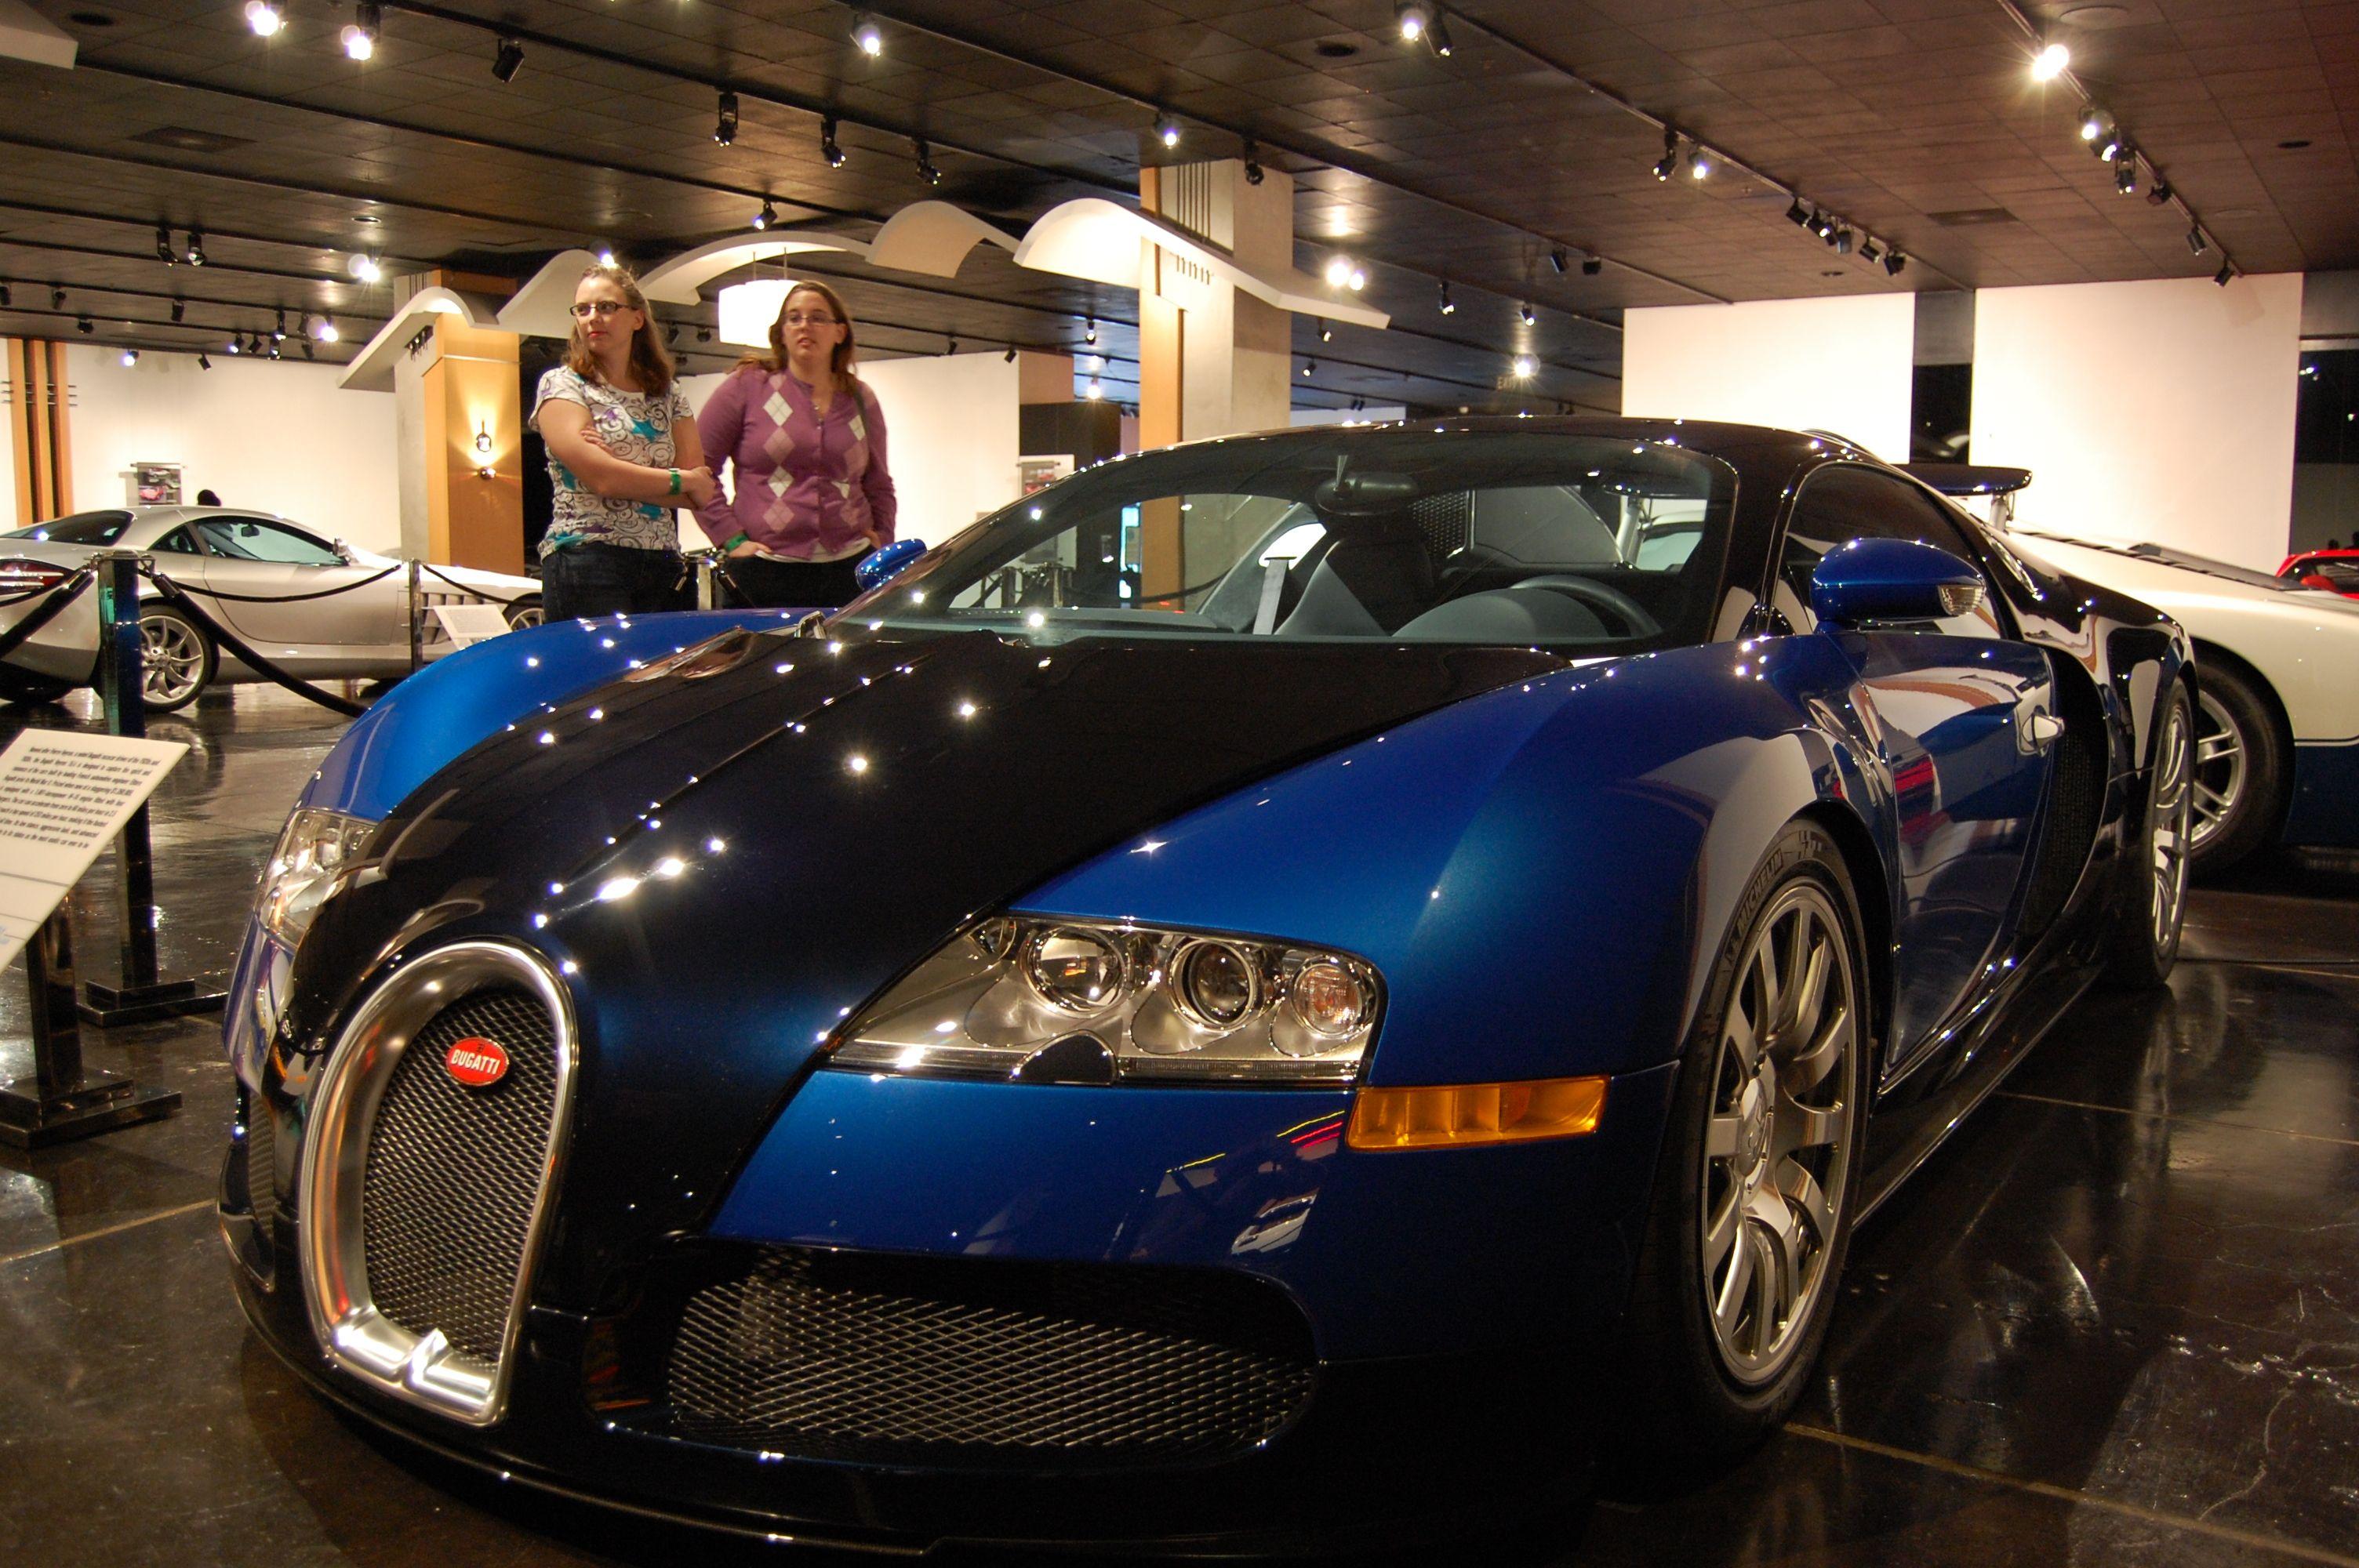 cdbd681bacc0592a3aa83f8492d1d823 Extraordinary Bugatti Veyron Price In Bangladesh Cars Trend